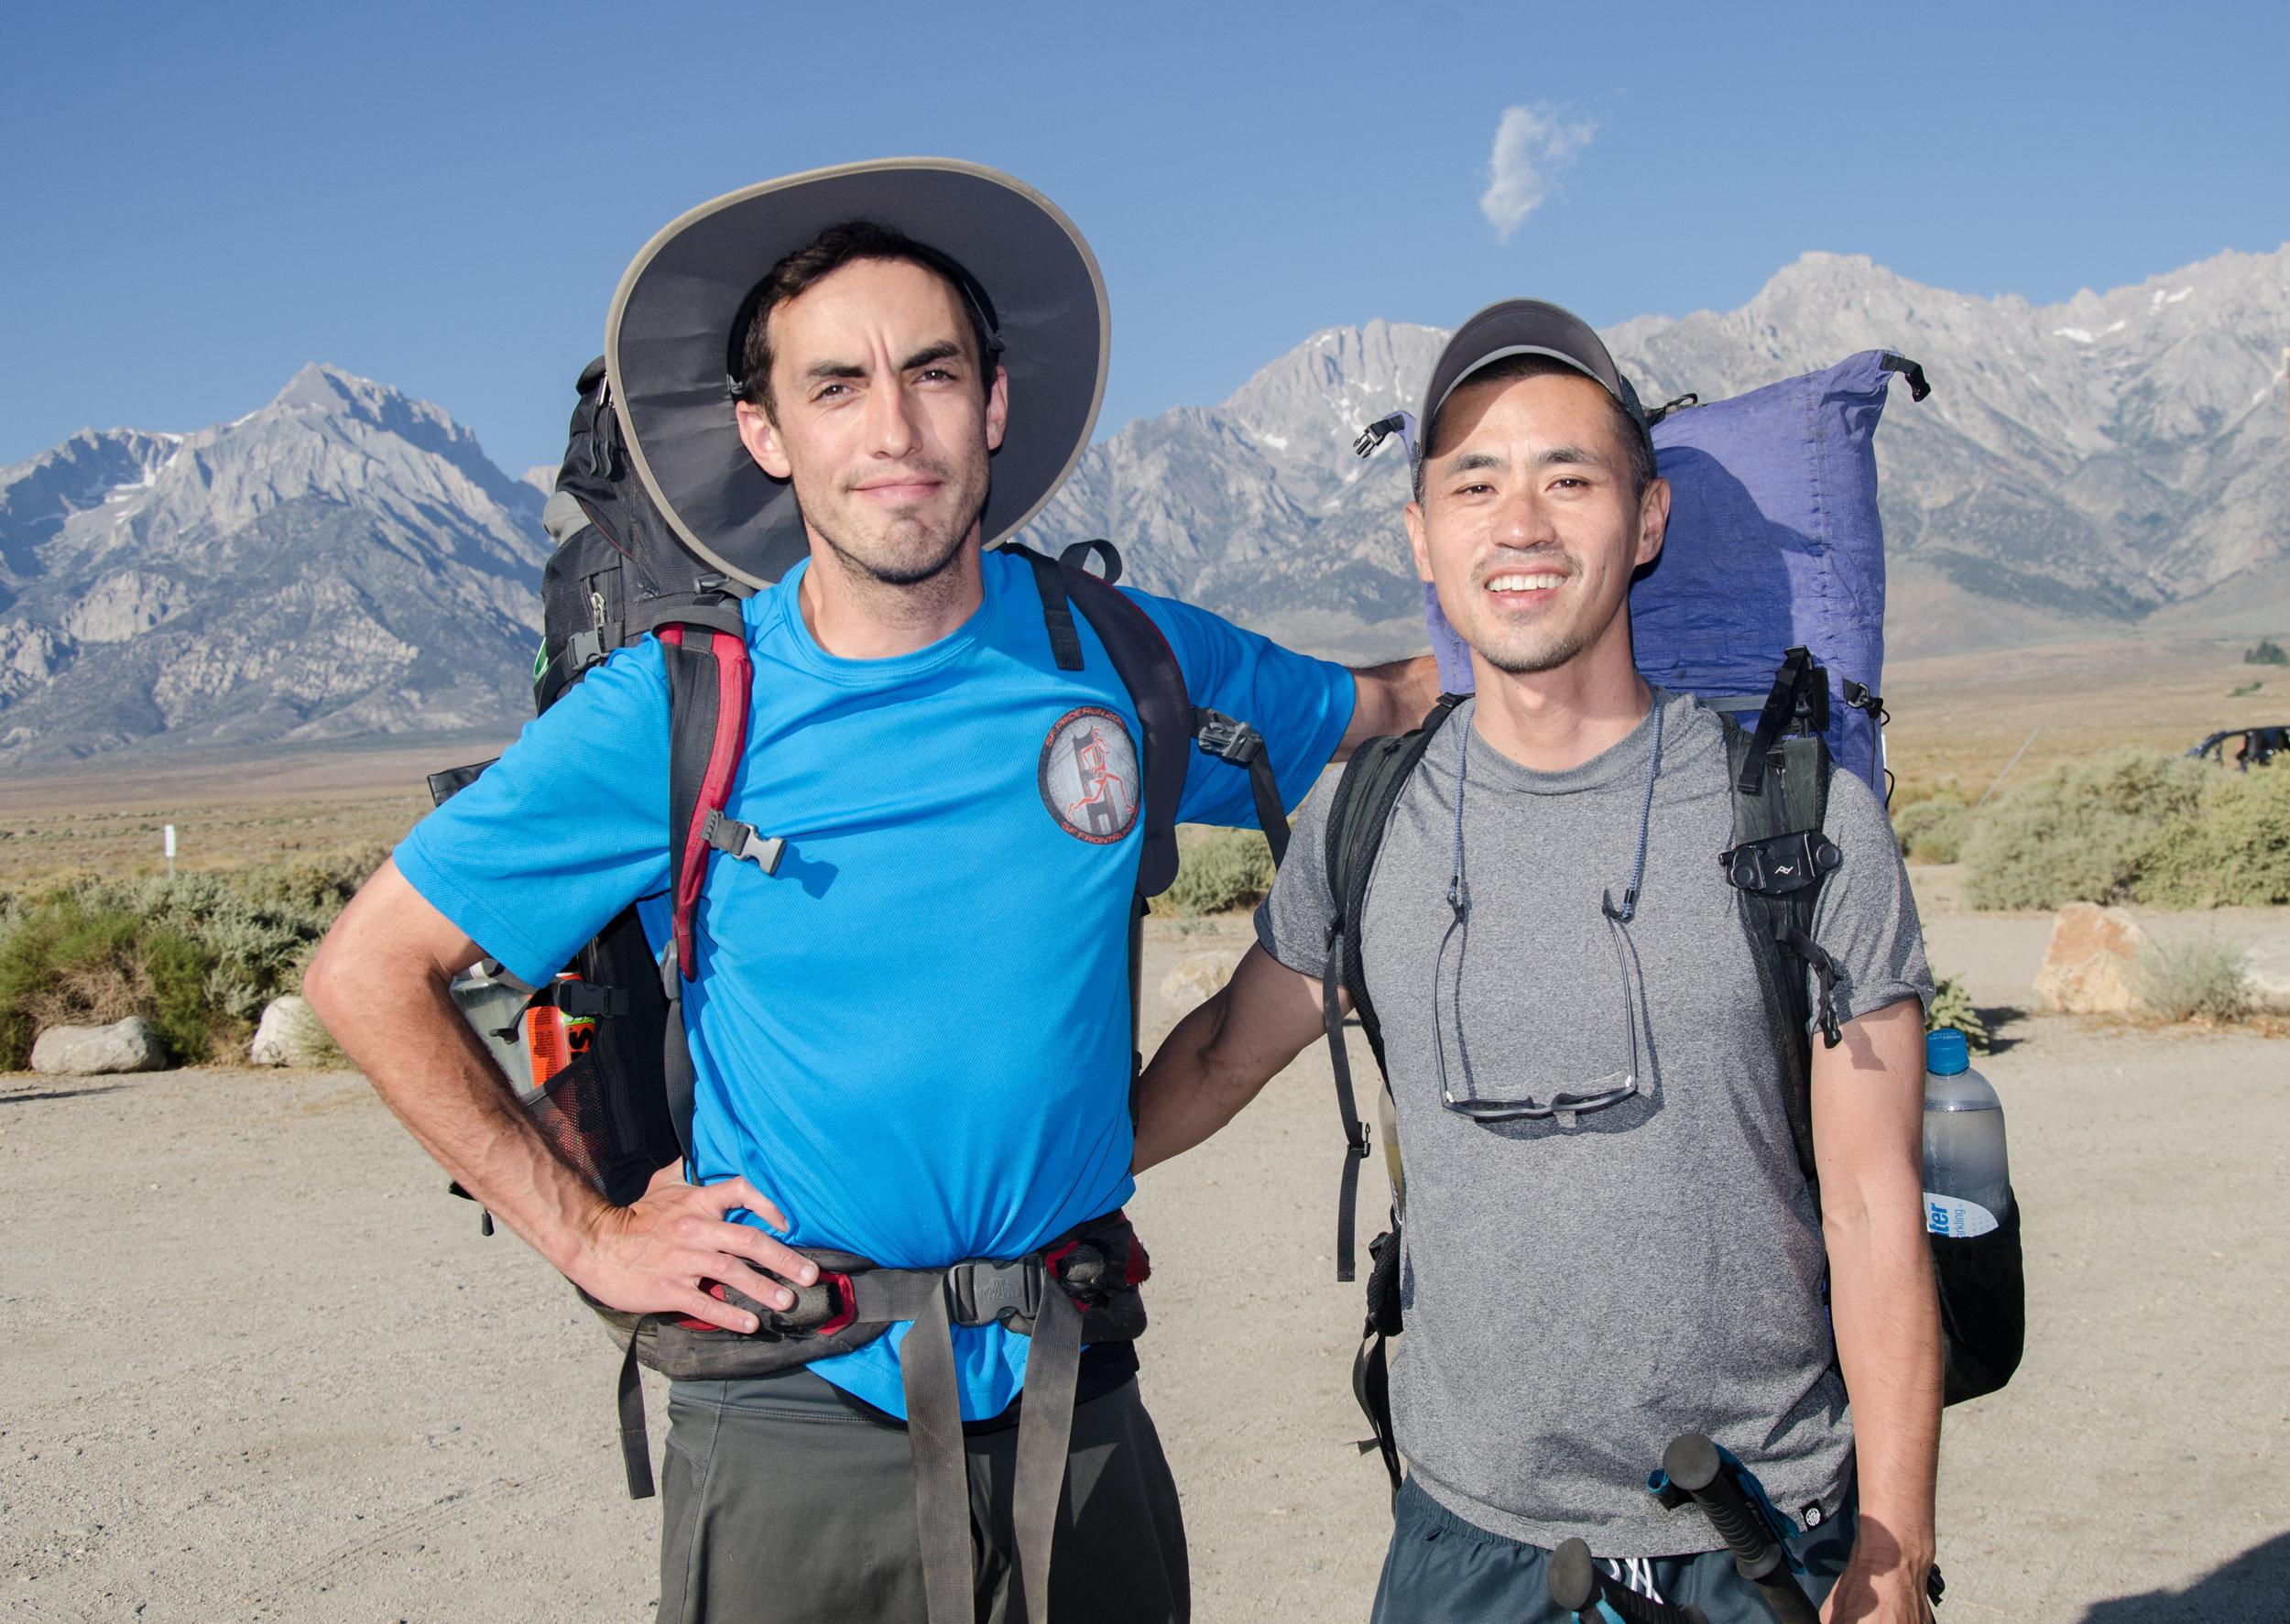 JMT Hikers Mike and Brendan